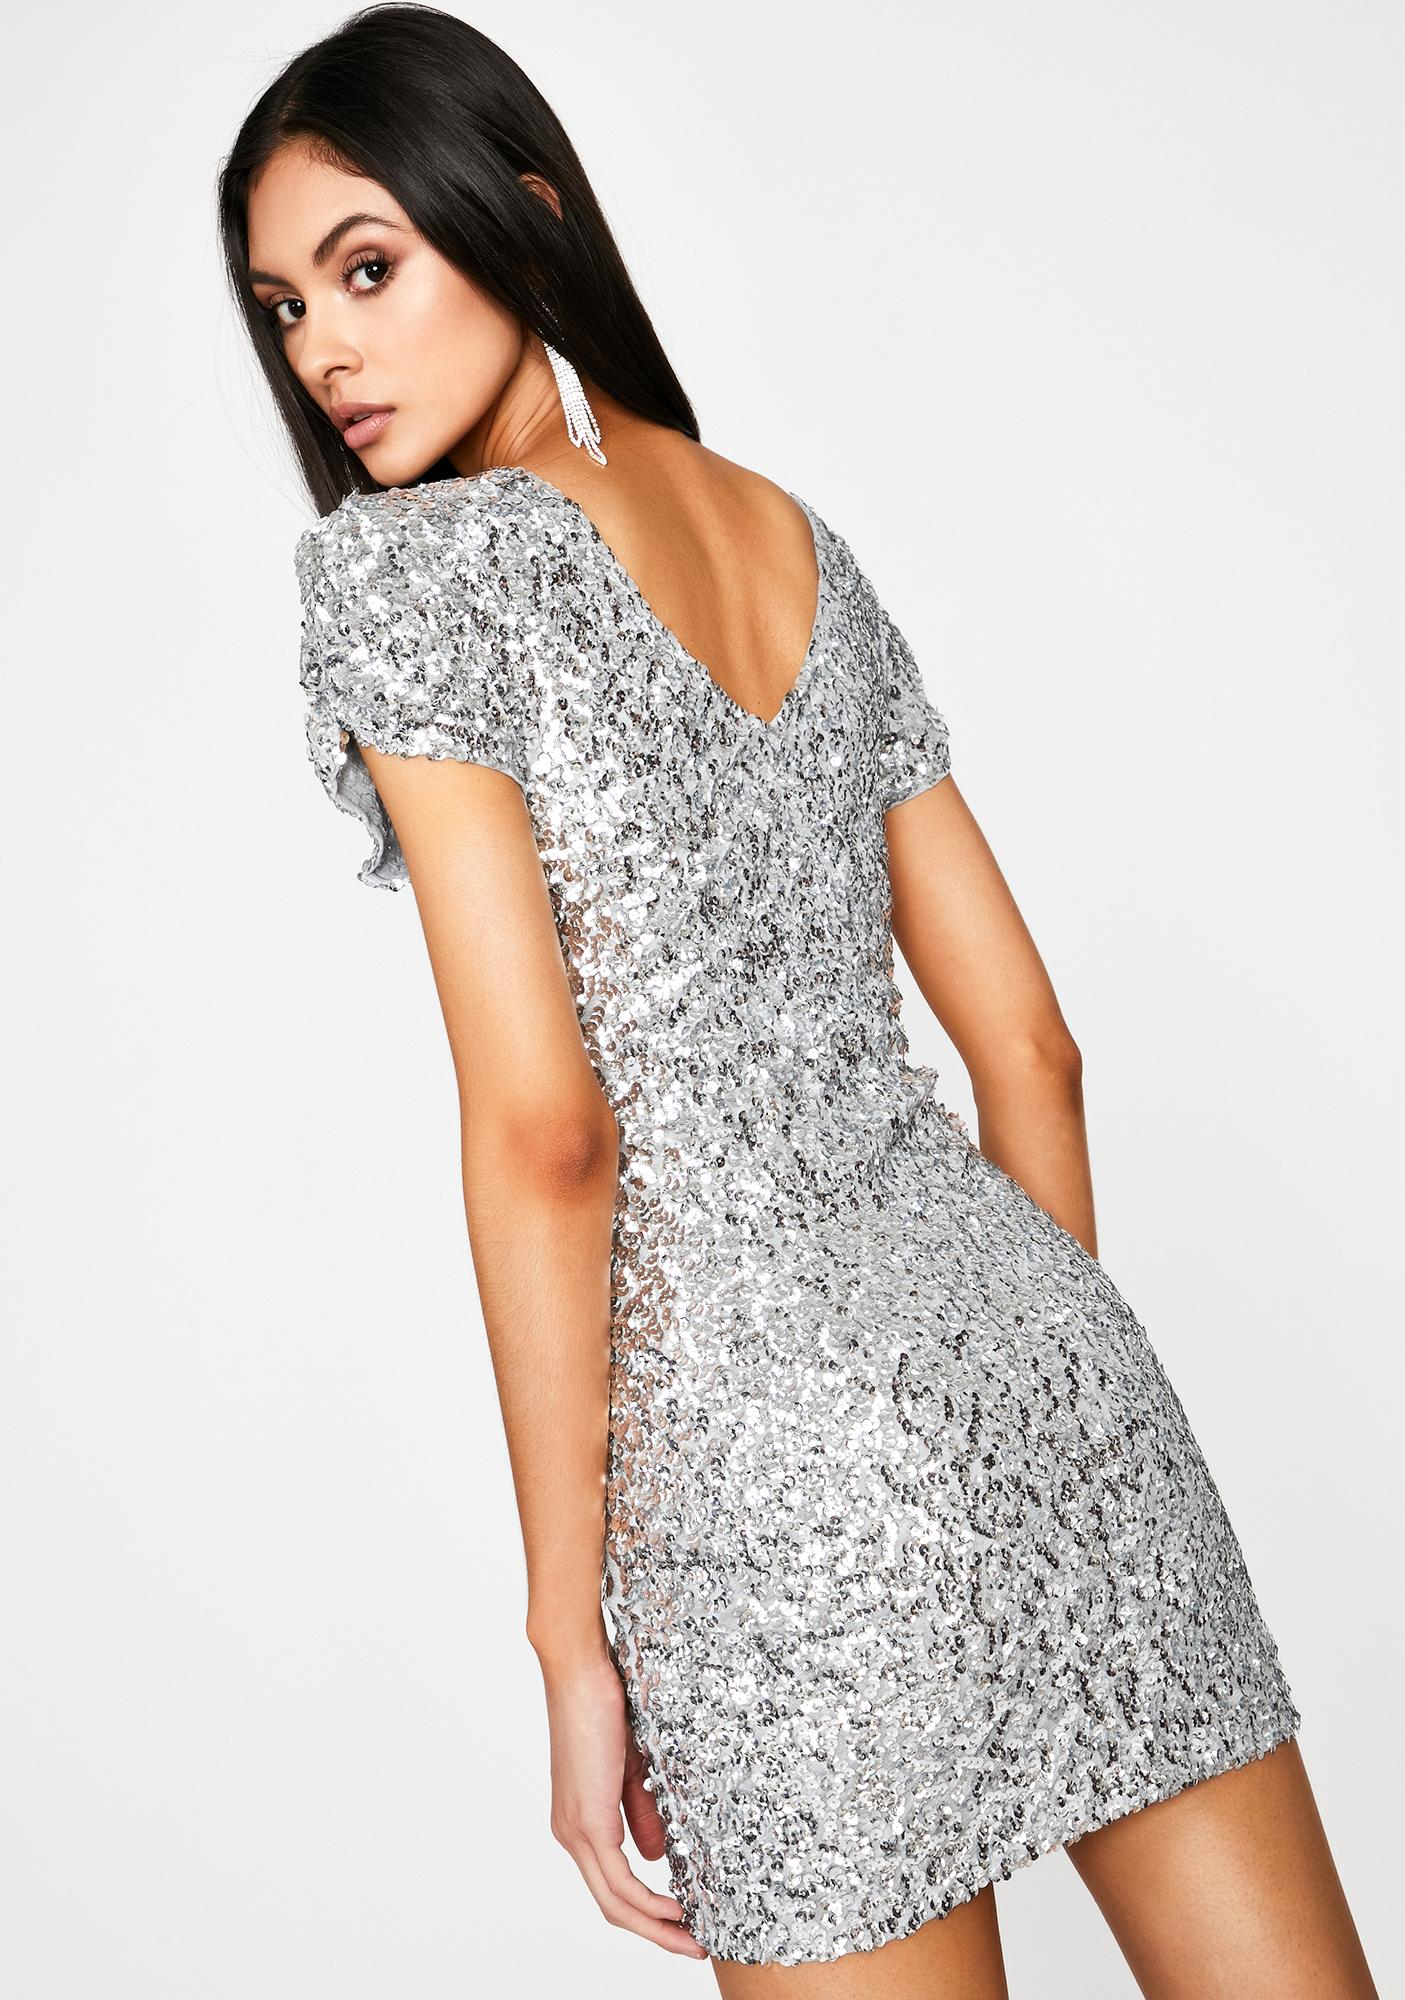 Chrome 80s Prom Night Sequin Dress